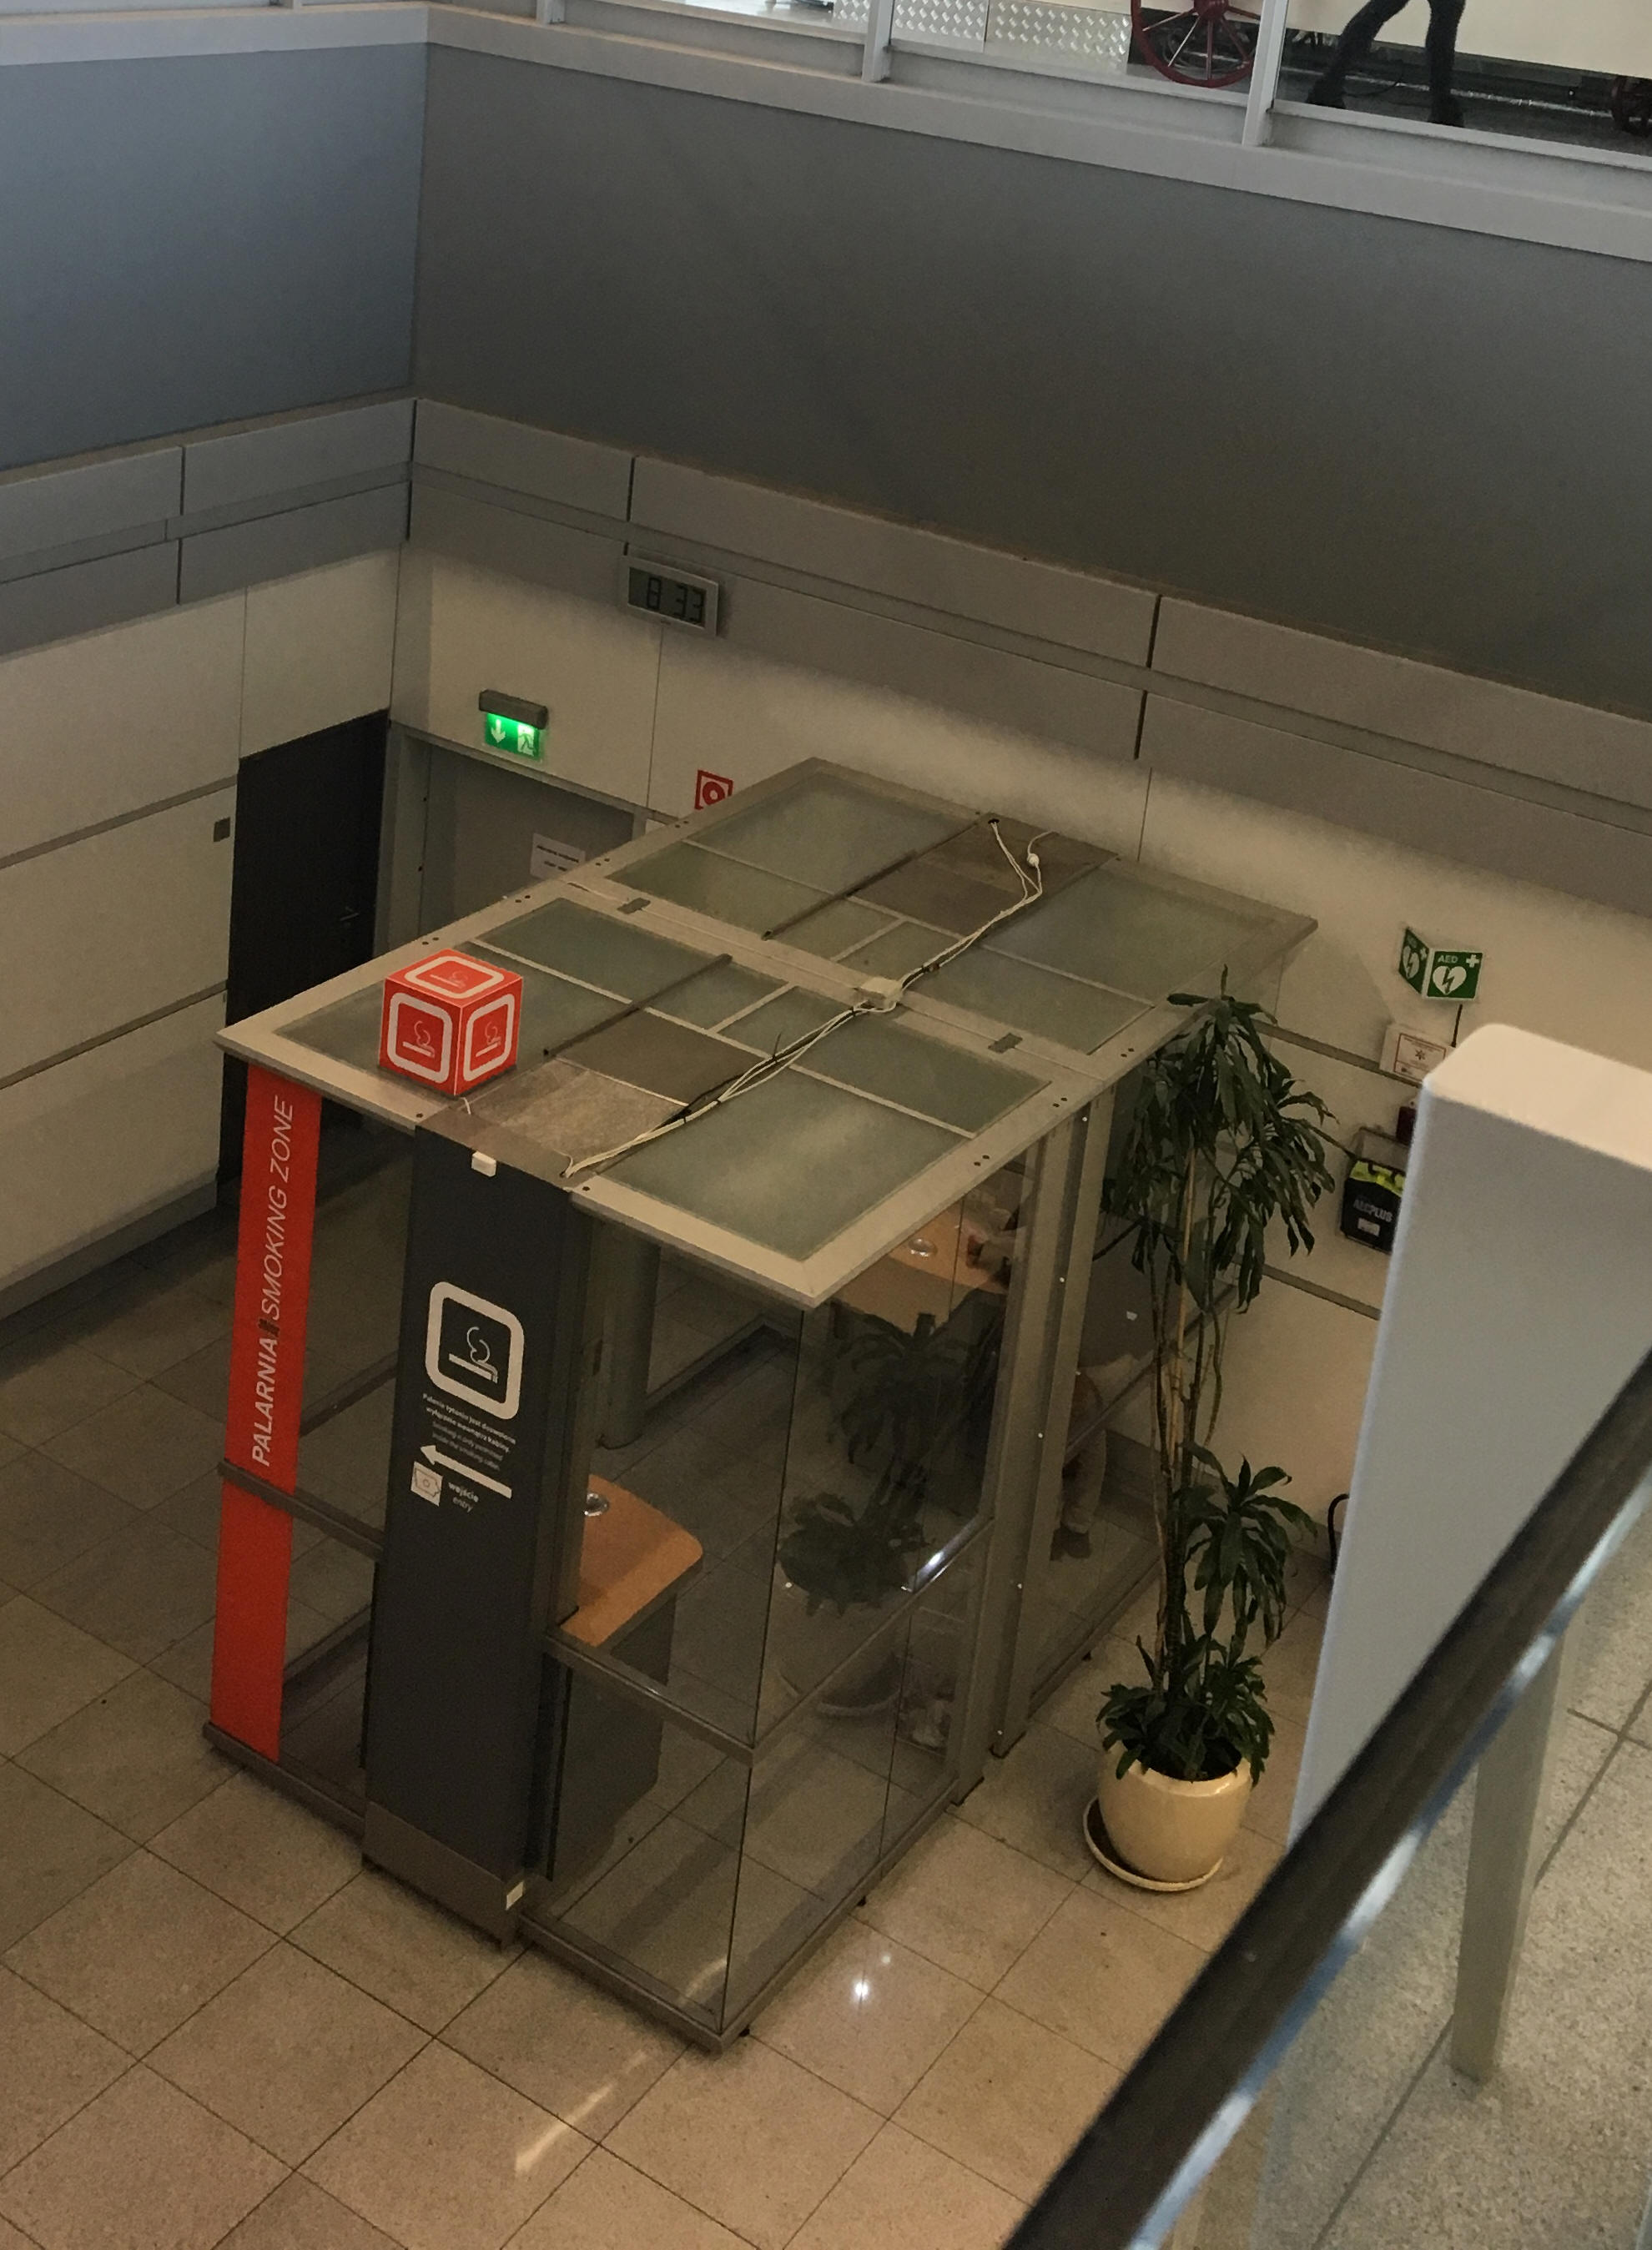 Smoking at Warsaw Chopin Airport (WAW)